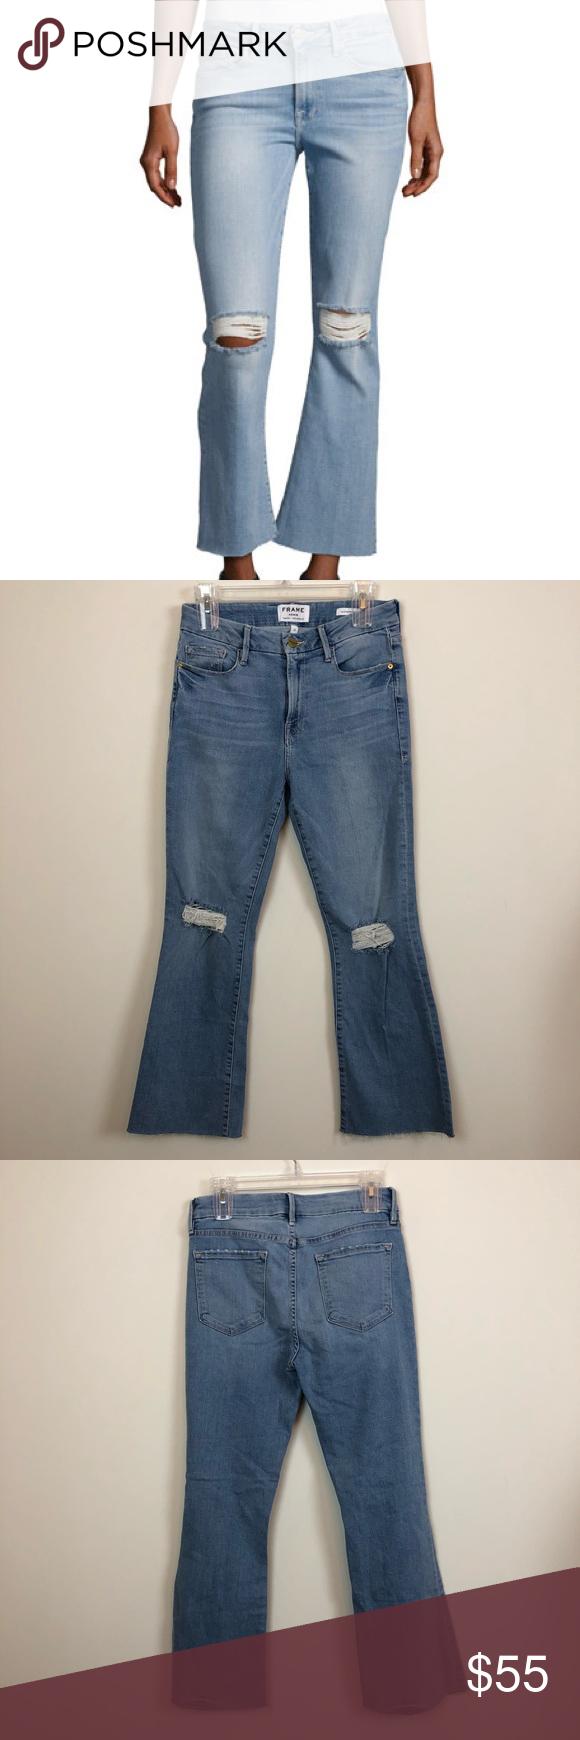 b418816e2f7f3 Frame Denim Le Crop Mini Boot Jeans Size 28 Good condition. Le Crop mini  boot